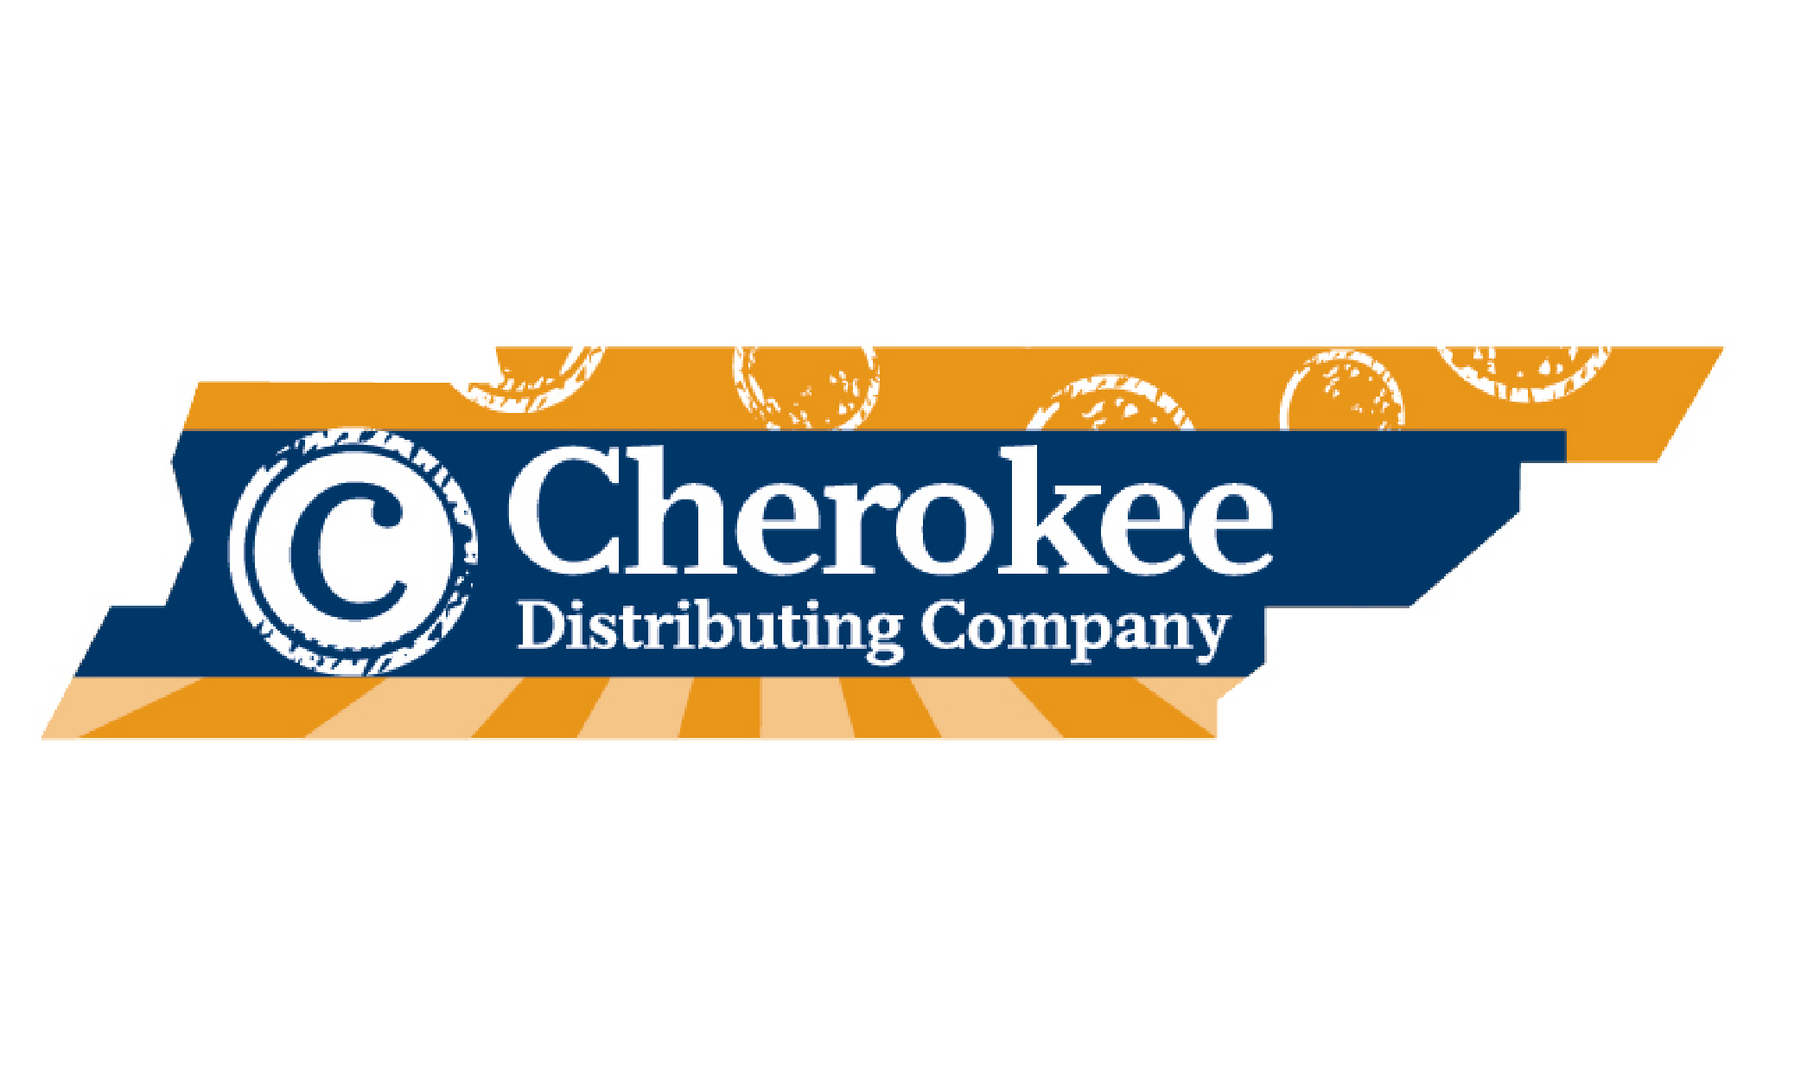 Cherokee-01.png